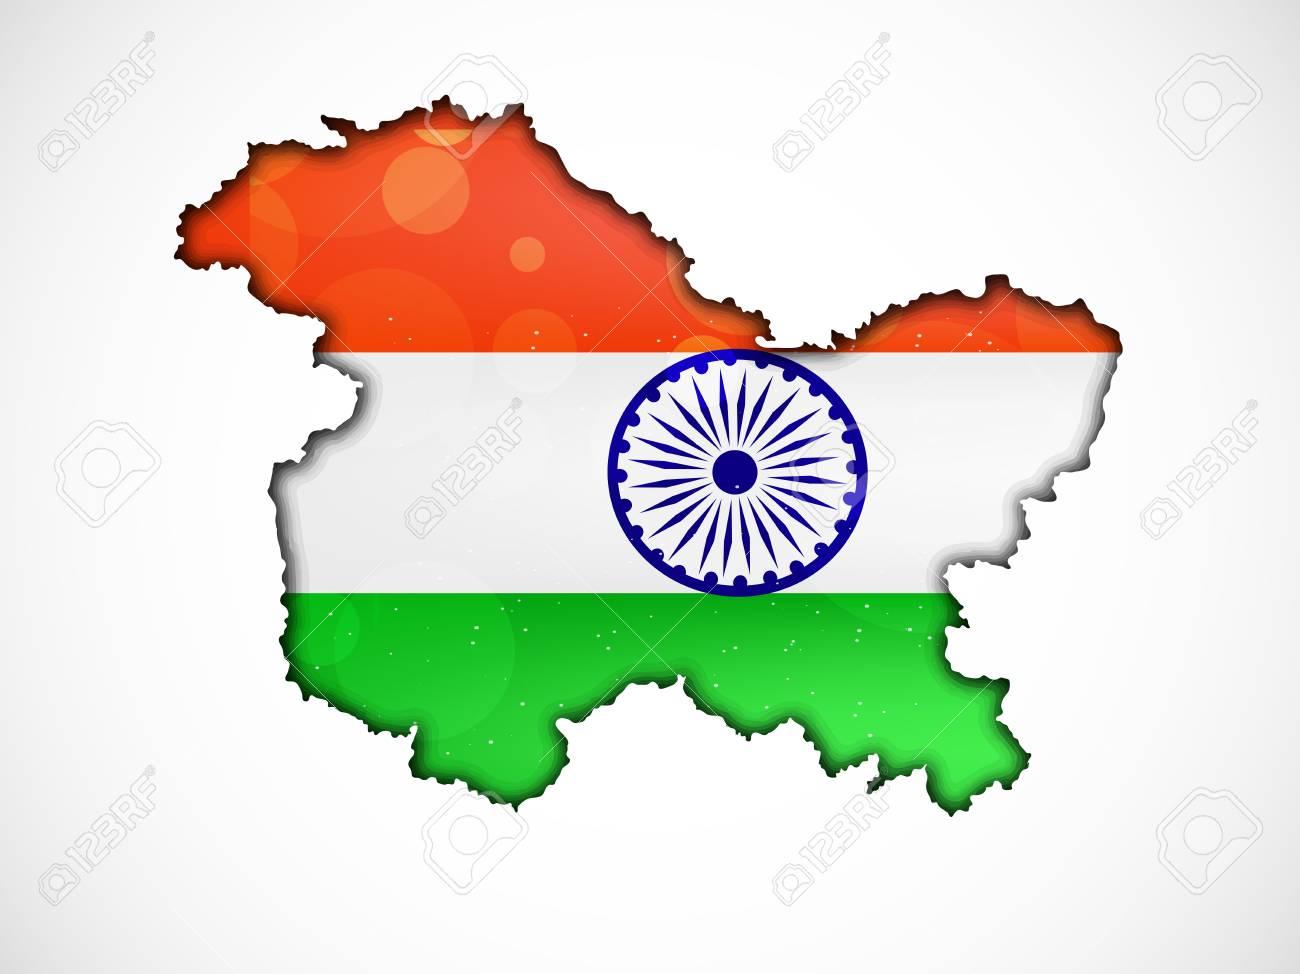 map jammu and kashmir flag Illustration Of Jammu Kashmir Map With Indian Flag Royalty Free map jammu and kashmir flag